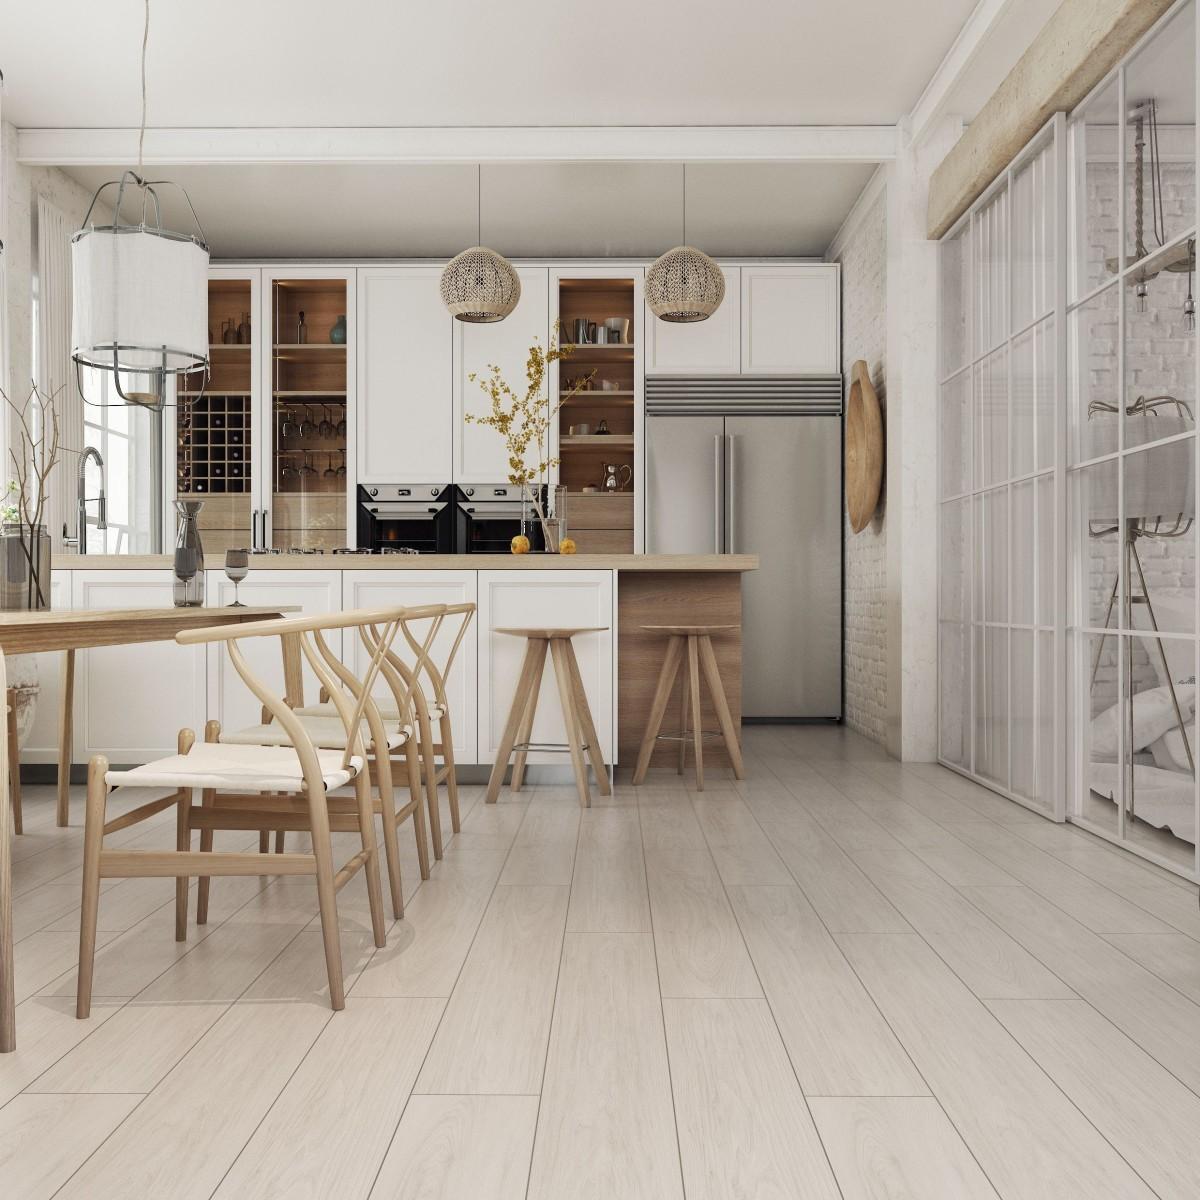 Ламинат Дуб Айвори 33 класс толщина 12 мм 1.293 м²